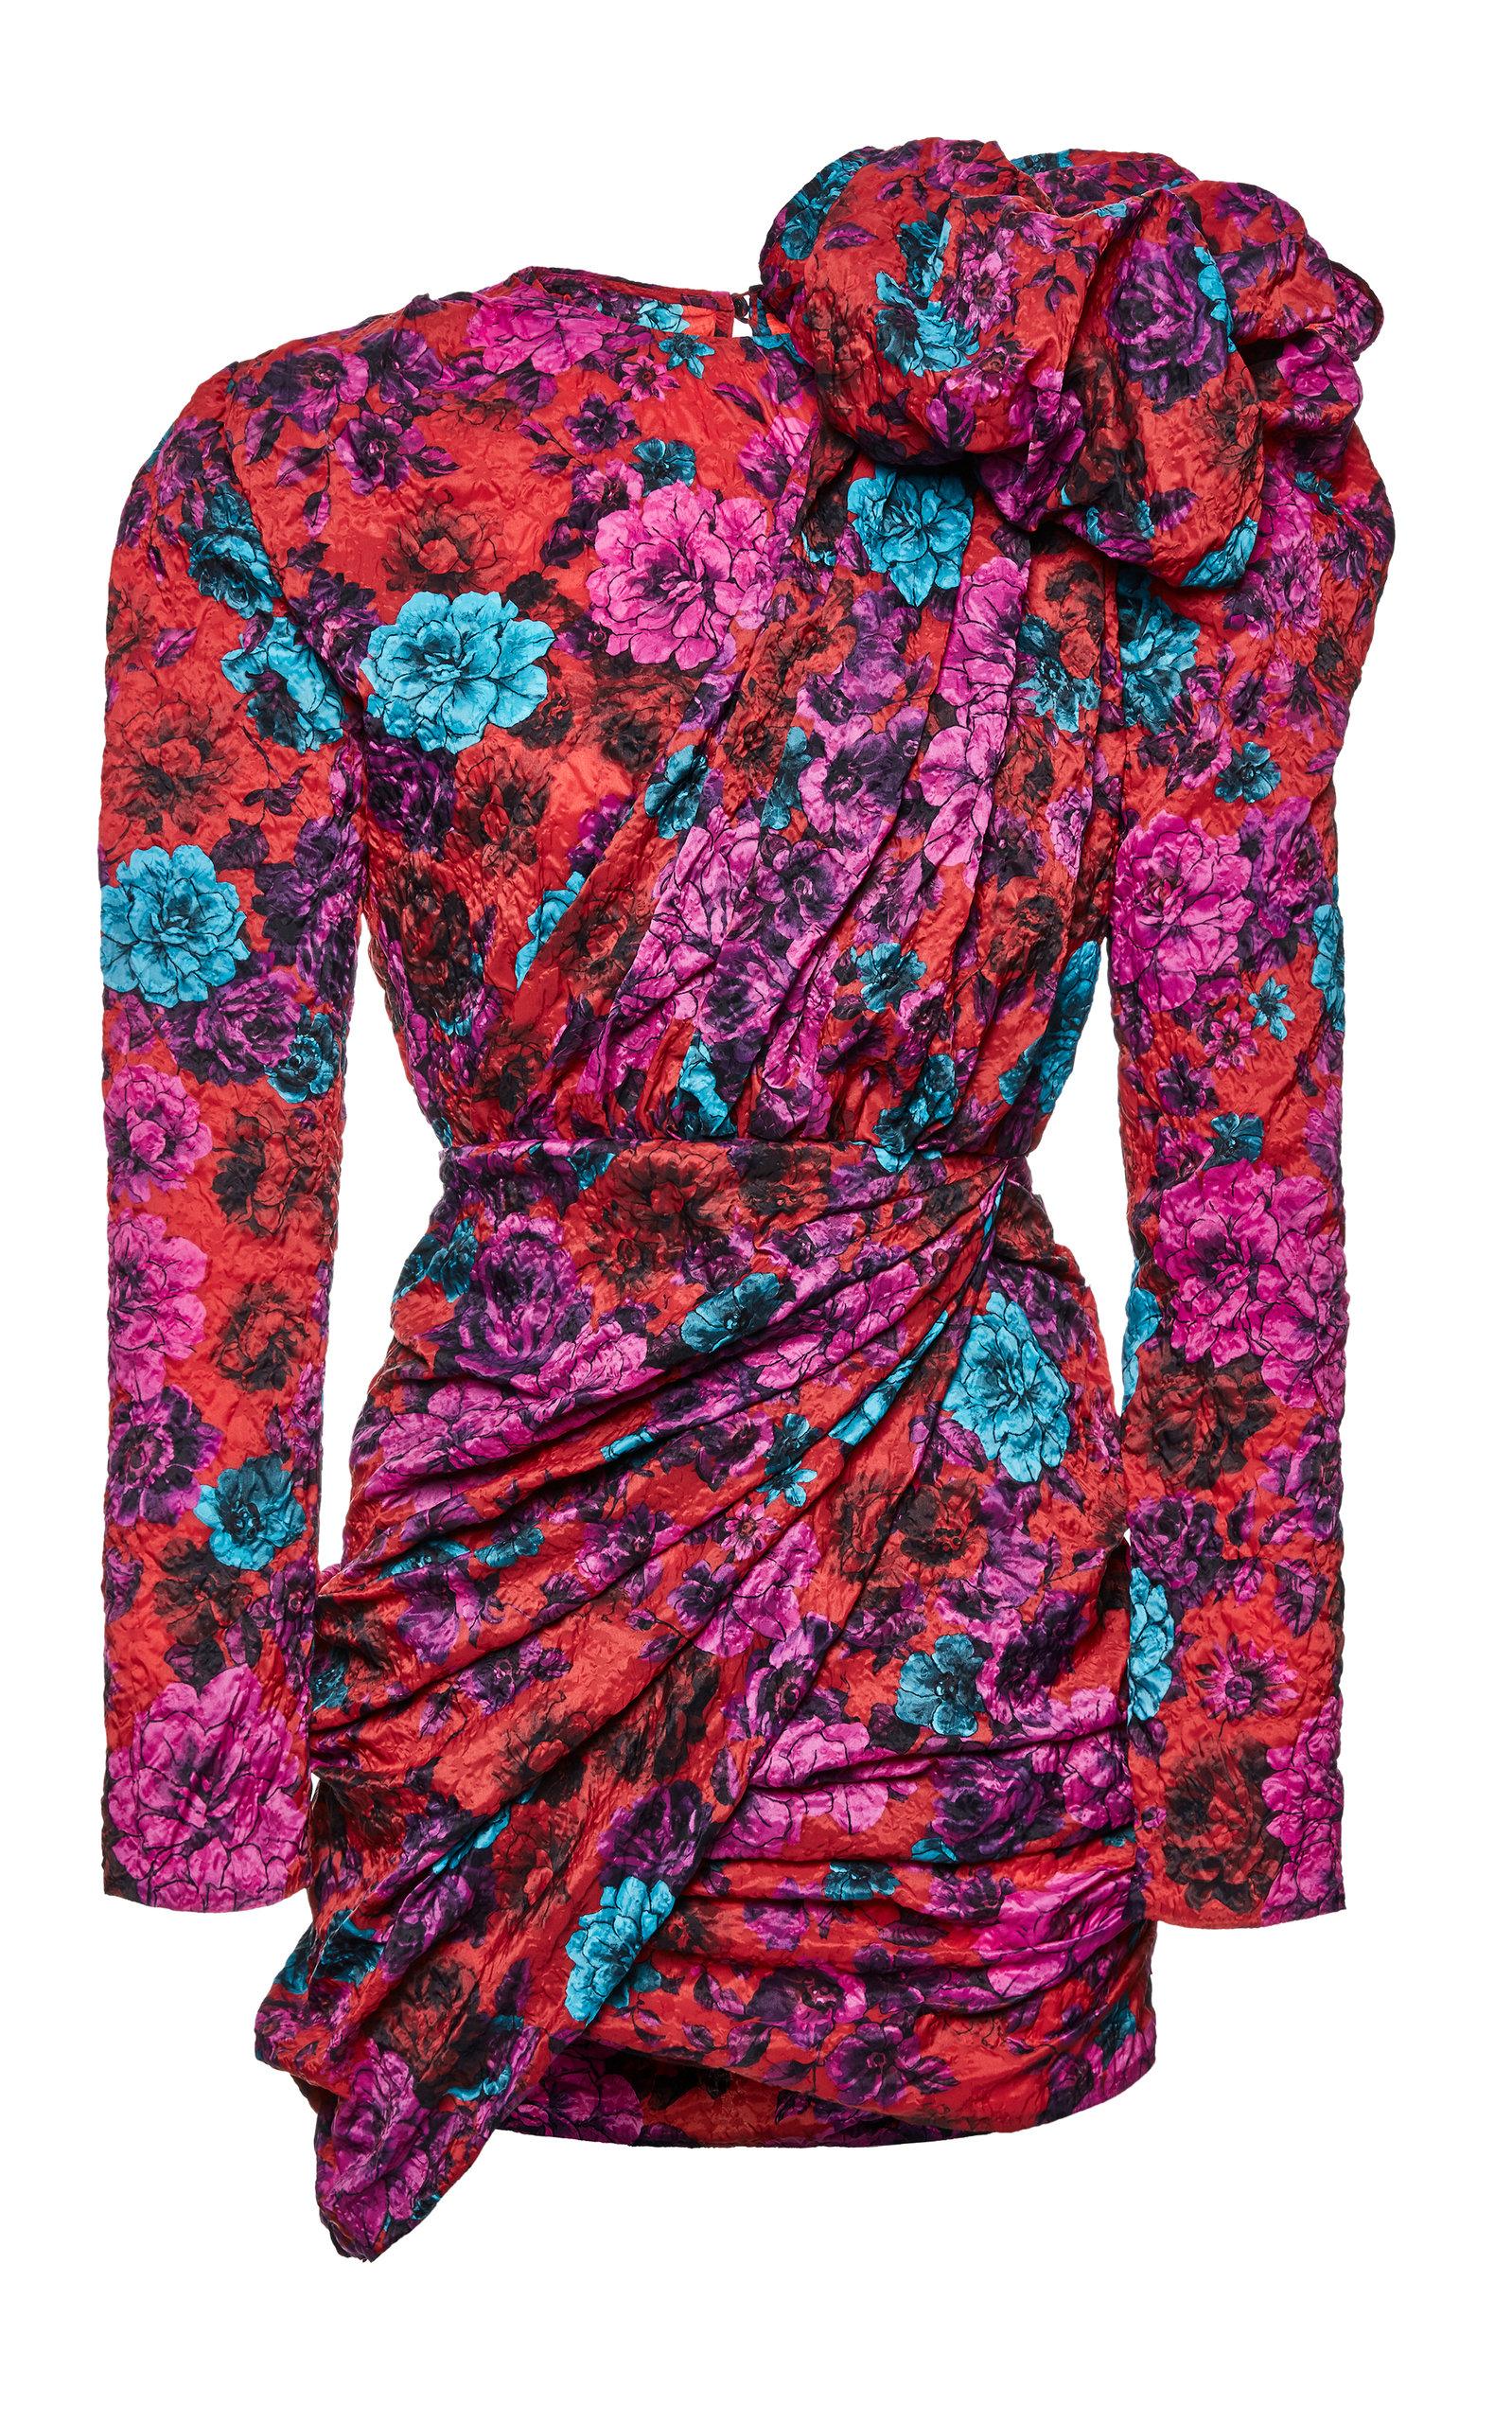 Buy Magda Butrym Crinkled Floral-Print Jacquard Asymmetric Mini Dress online, shop Magda Butrym at the best price